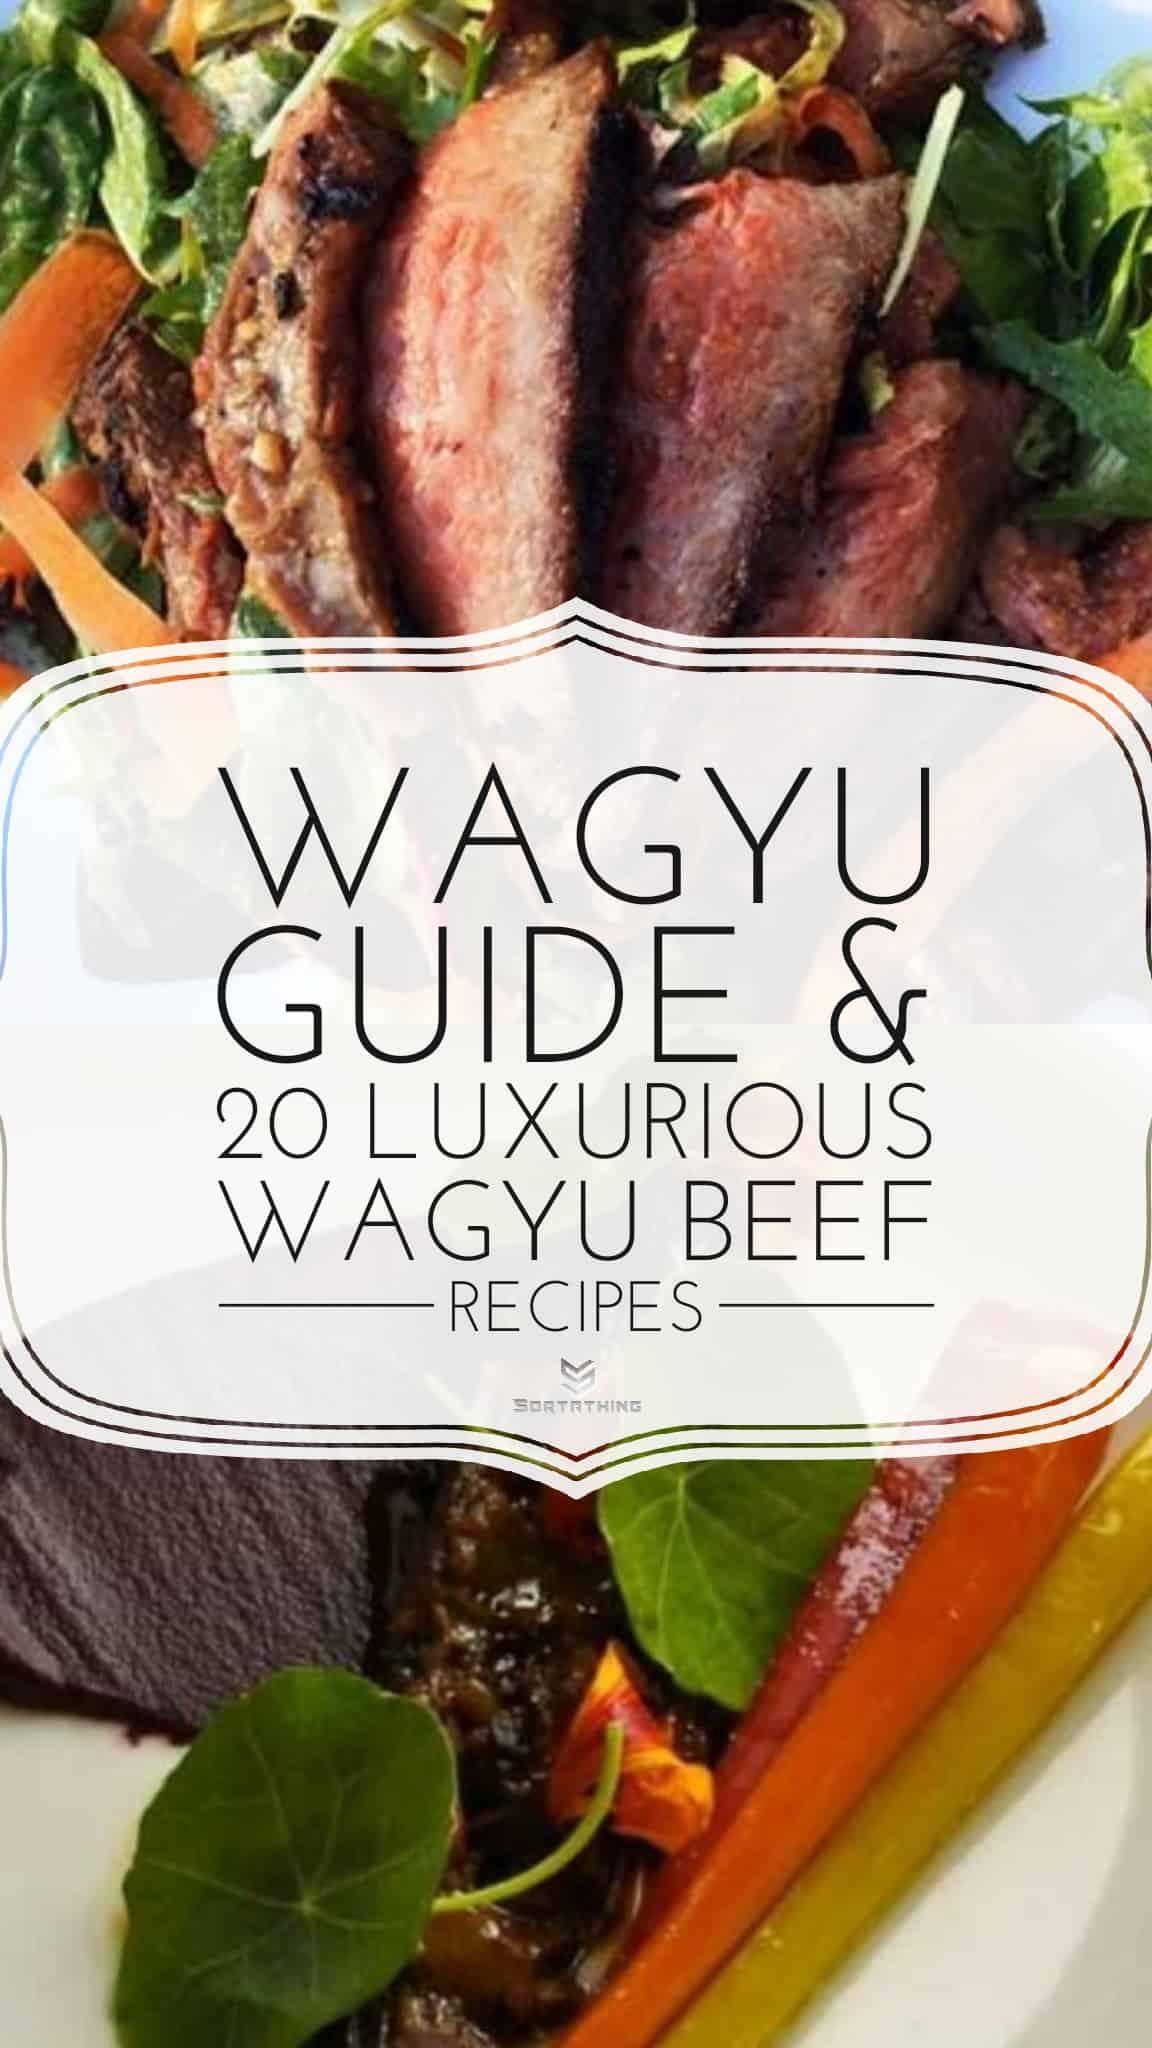 Wagyu Rib Lifter Salad and Braised Wagyu Oxtail